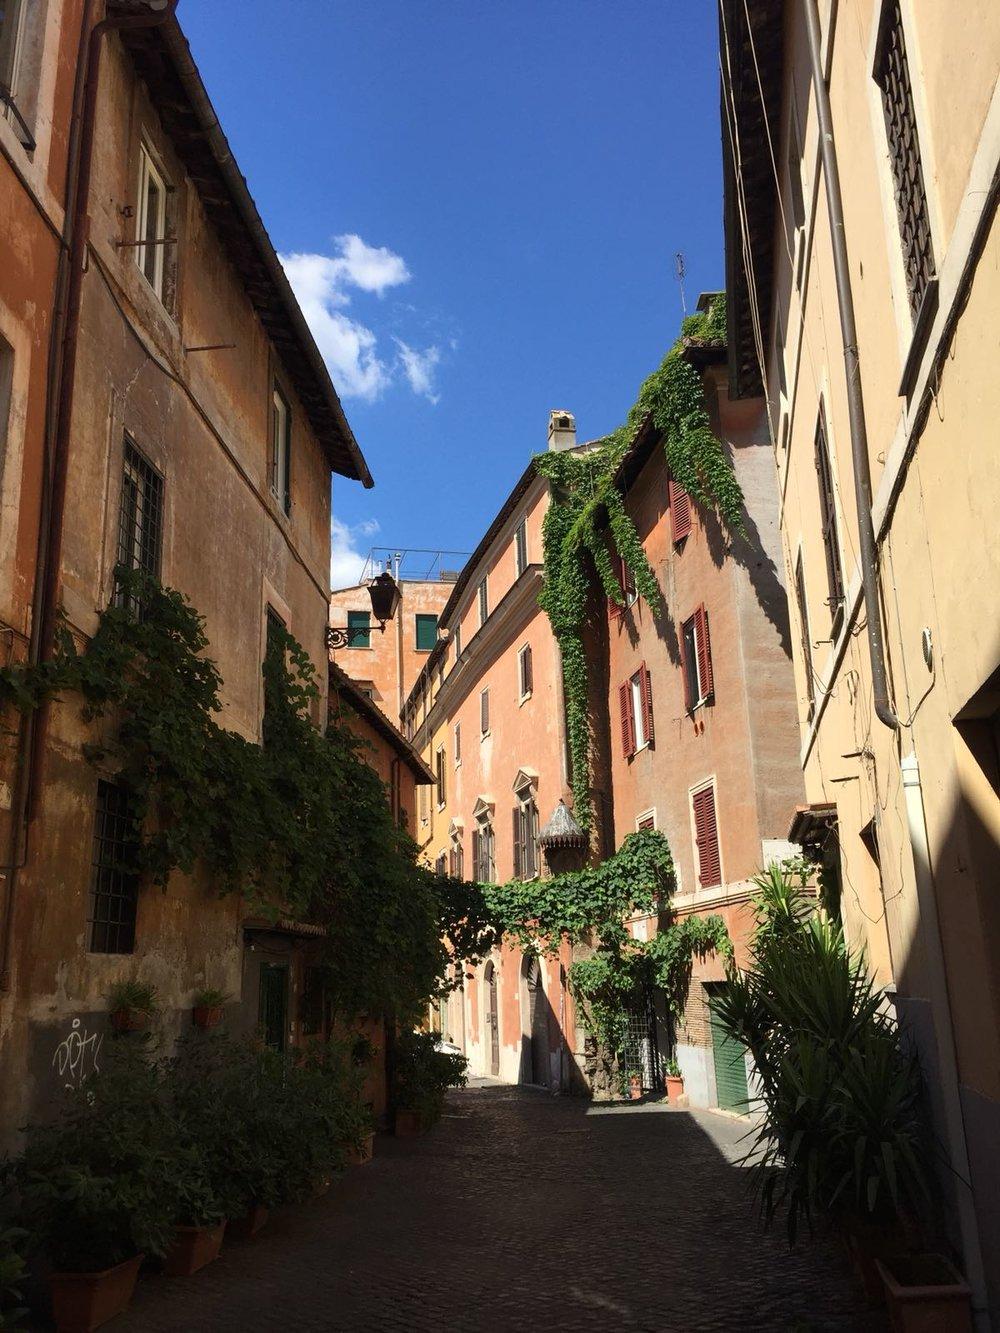 Rome photo.jpg